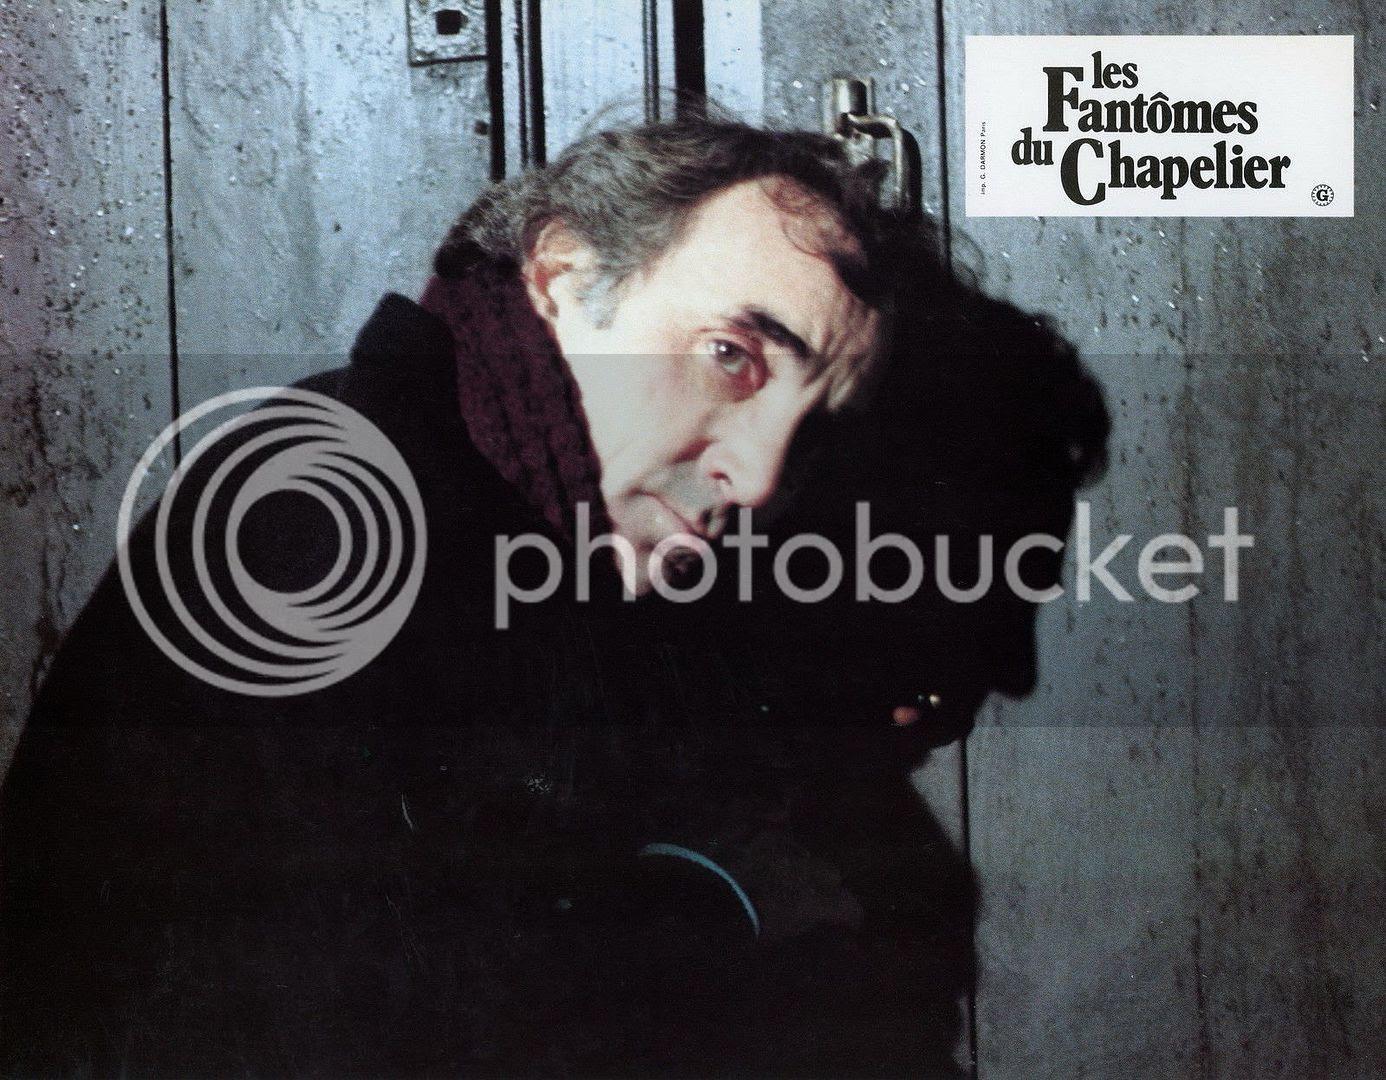 photo poster_fantome_chapelier-5.jpg